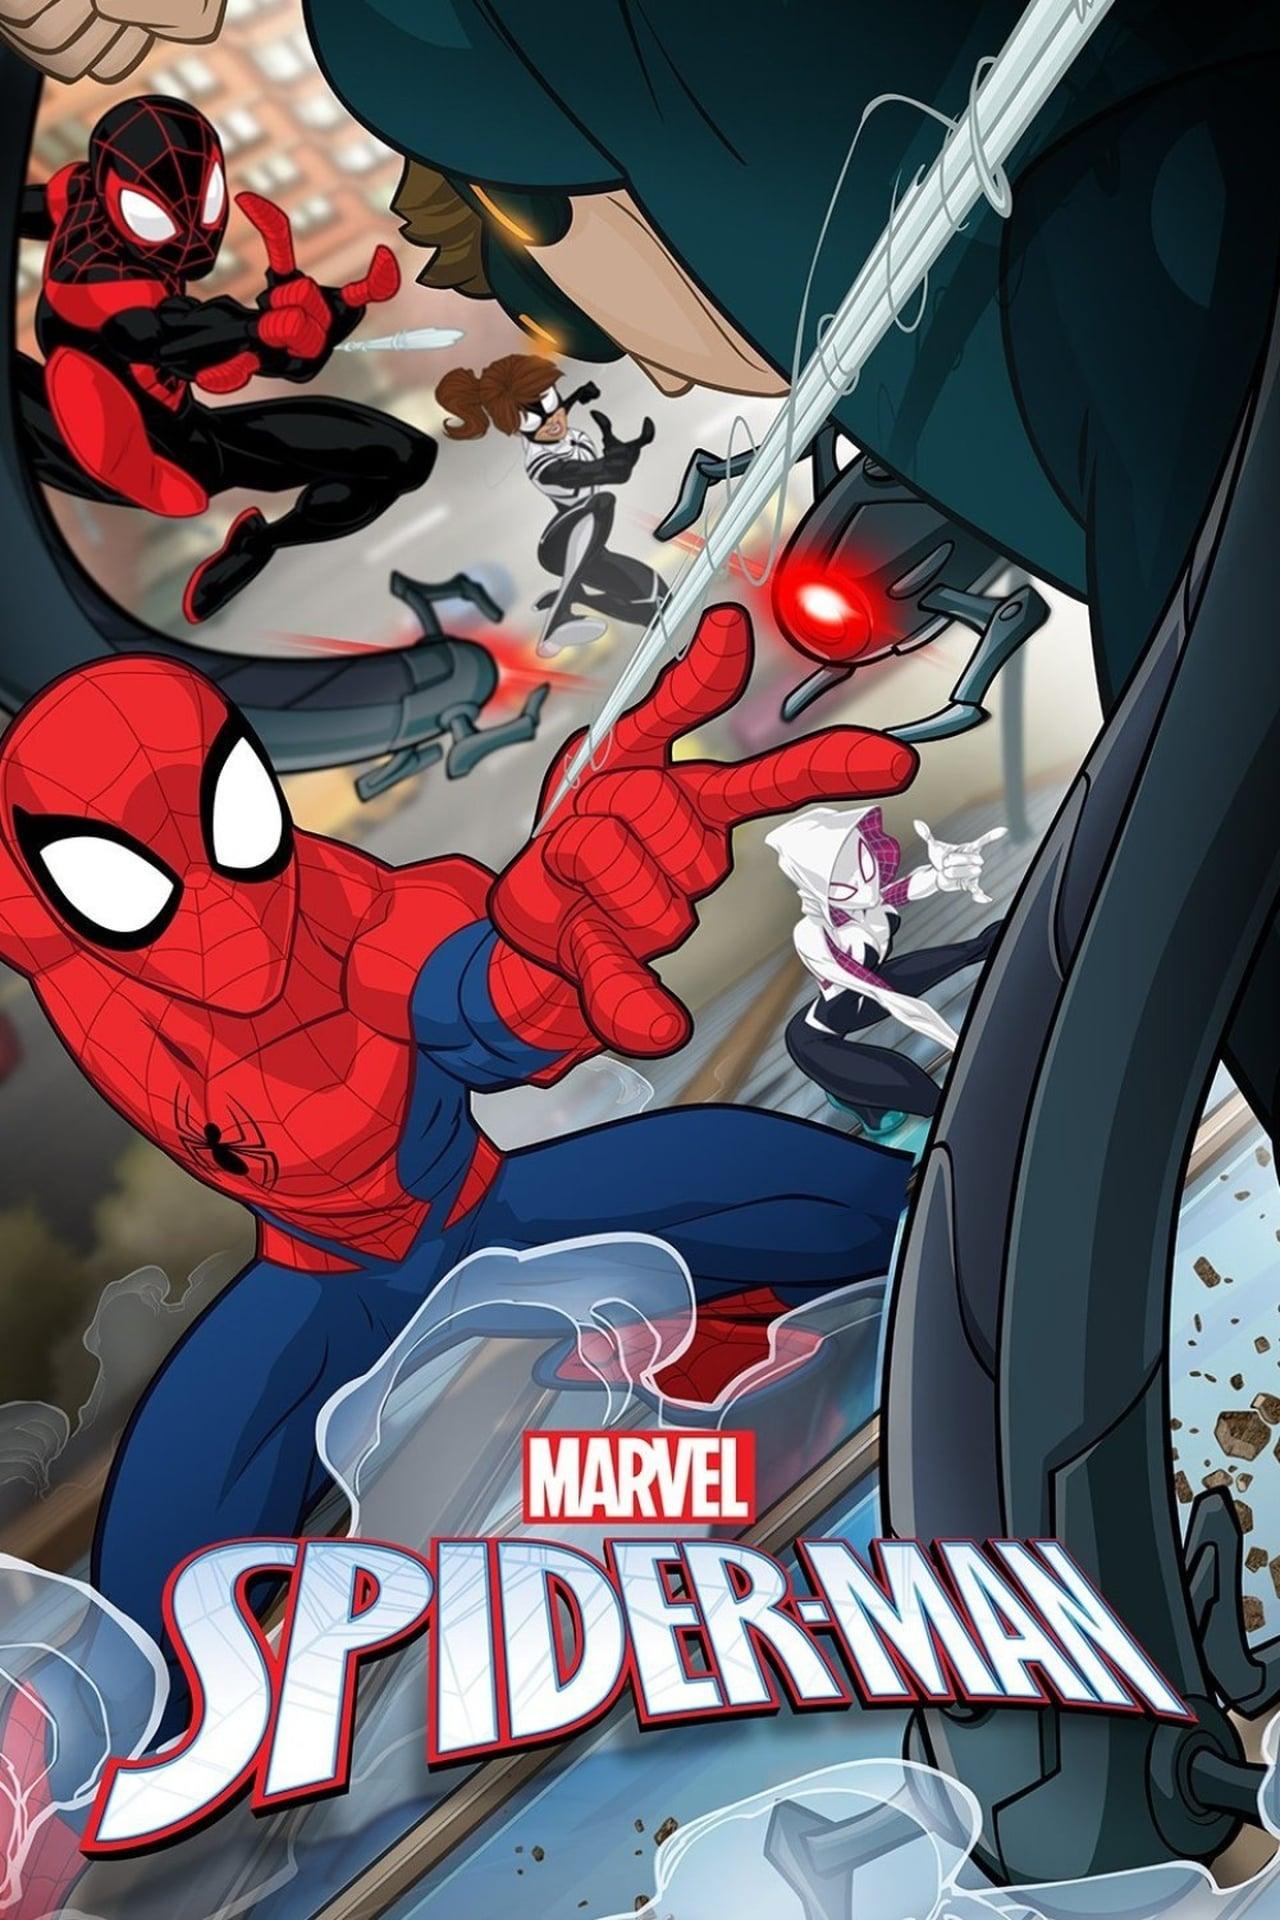 Marvel's Spider-man Season 2